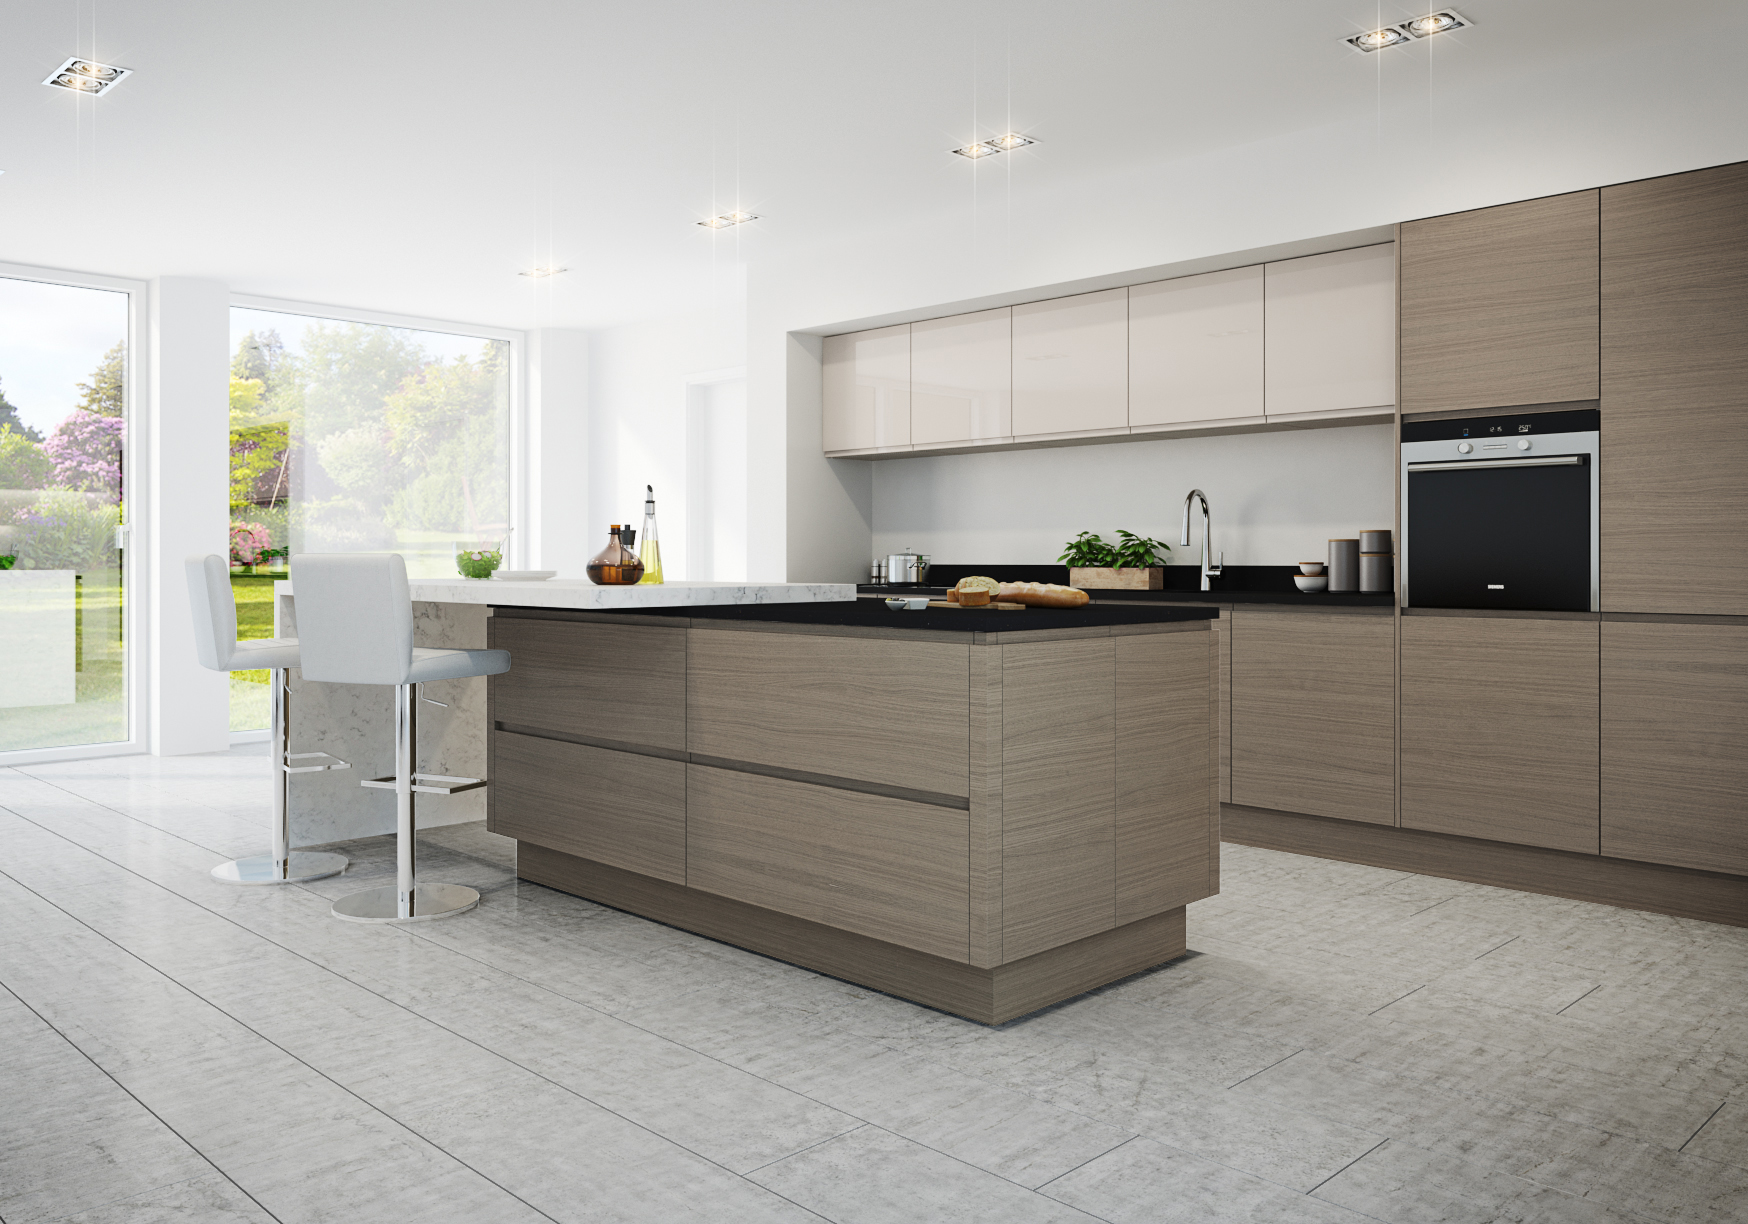 J Handle kitchen